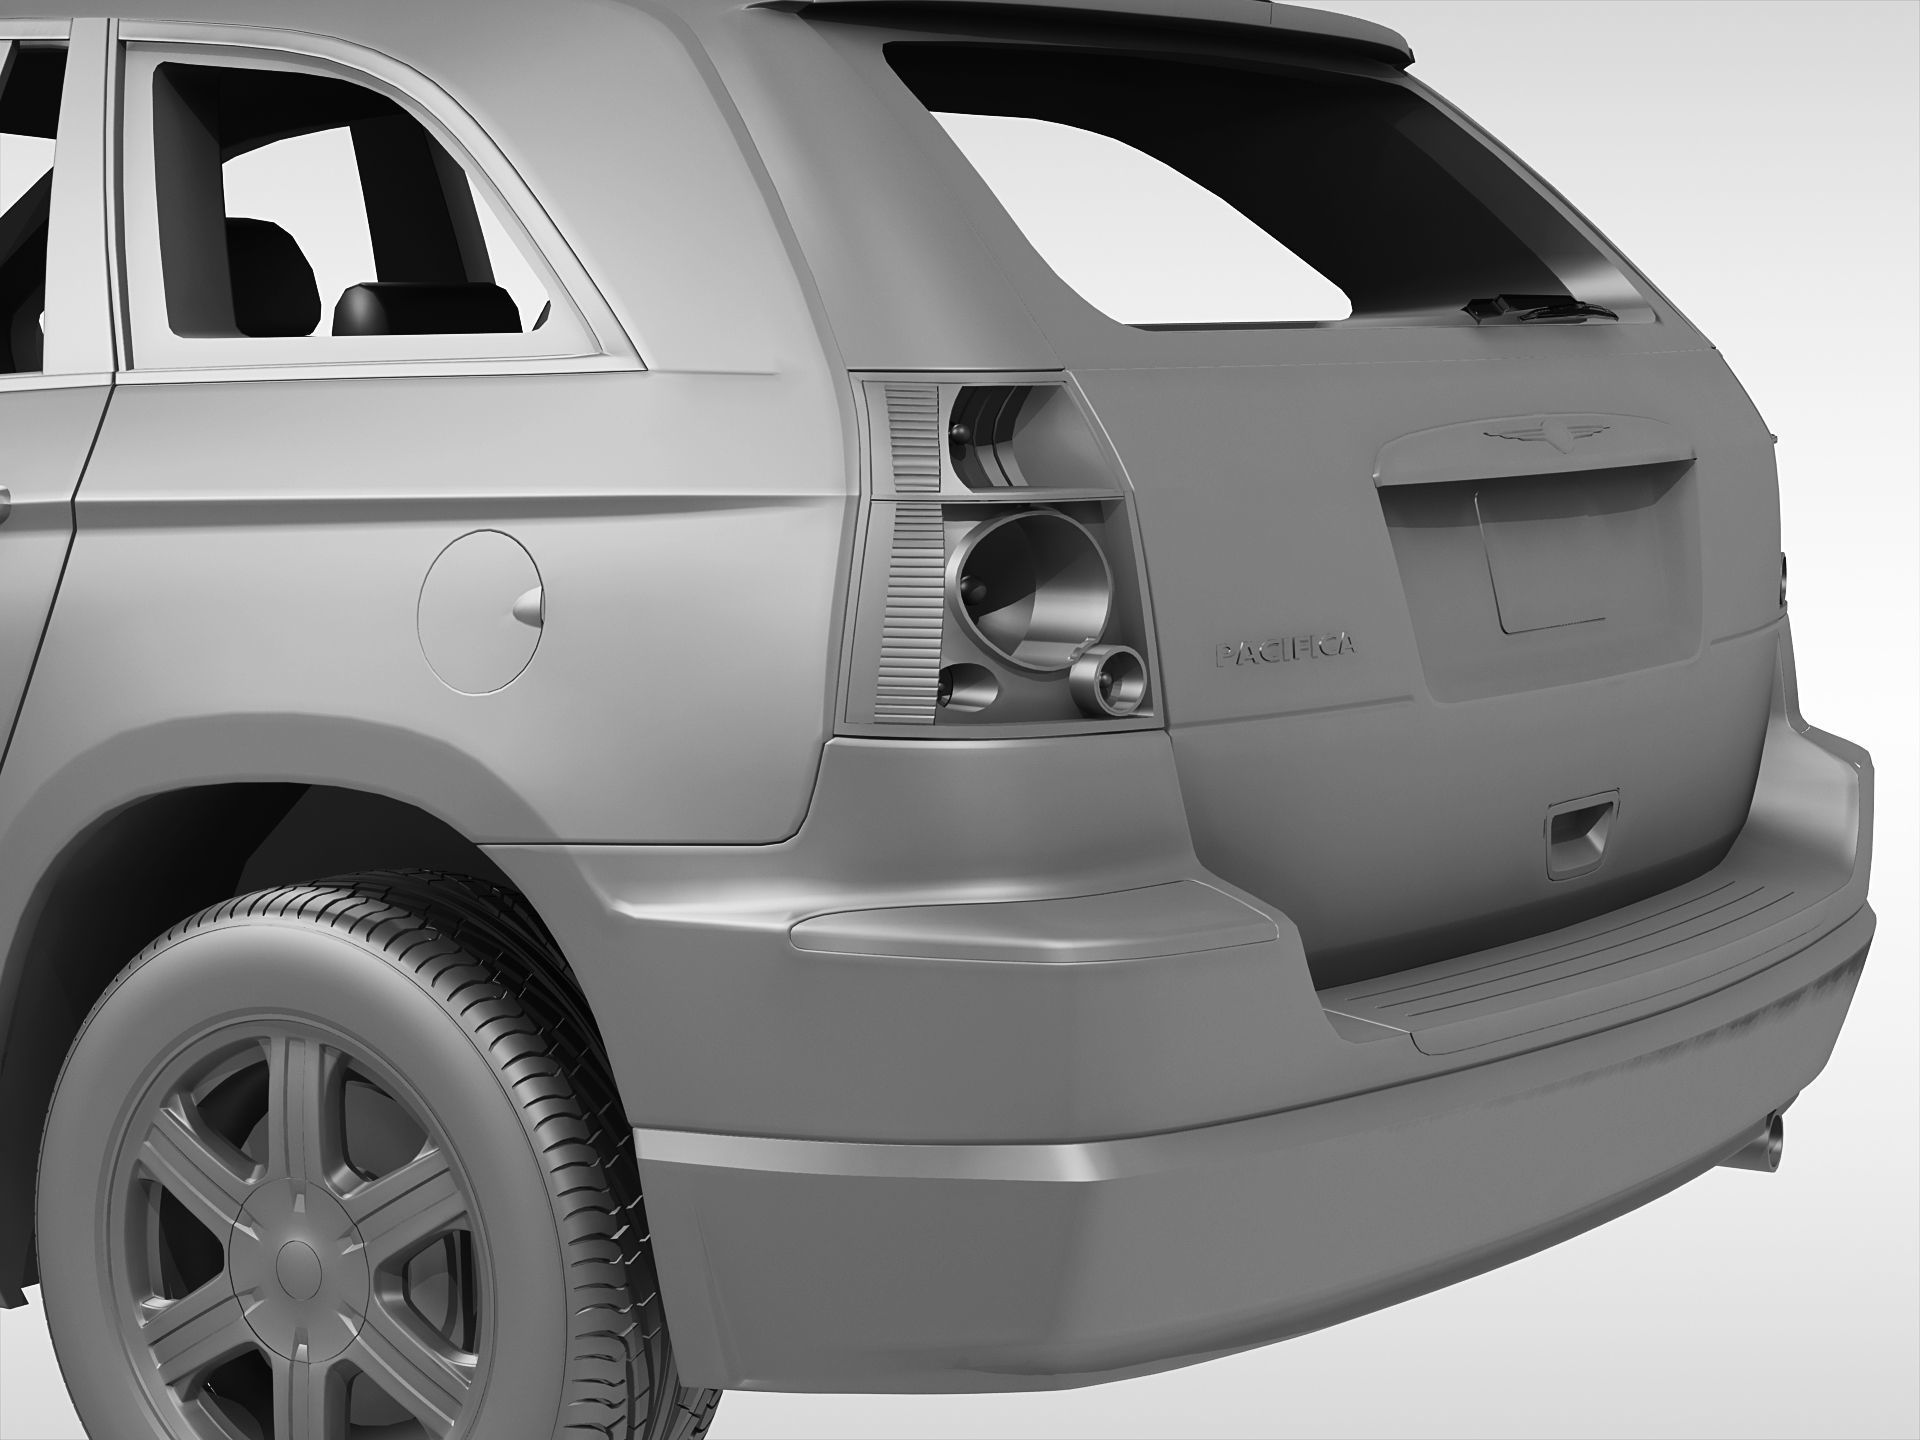 suv sharing best chrysler autotrader platform list models twins ca fraternal newsfeatures